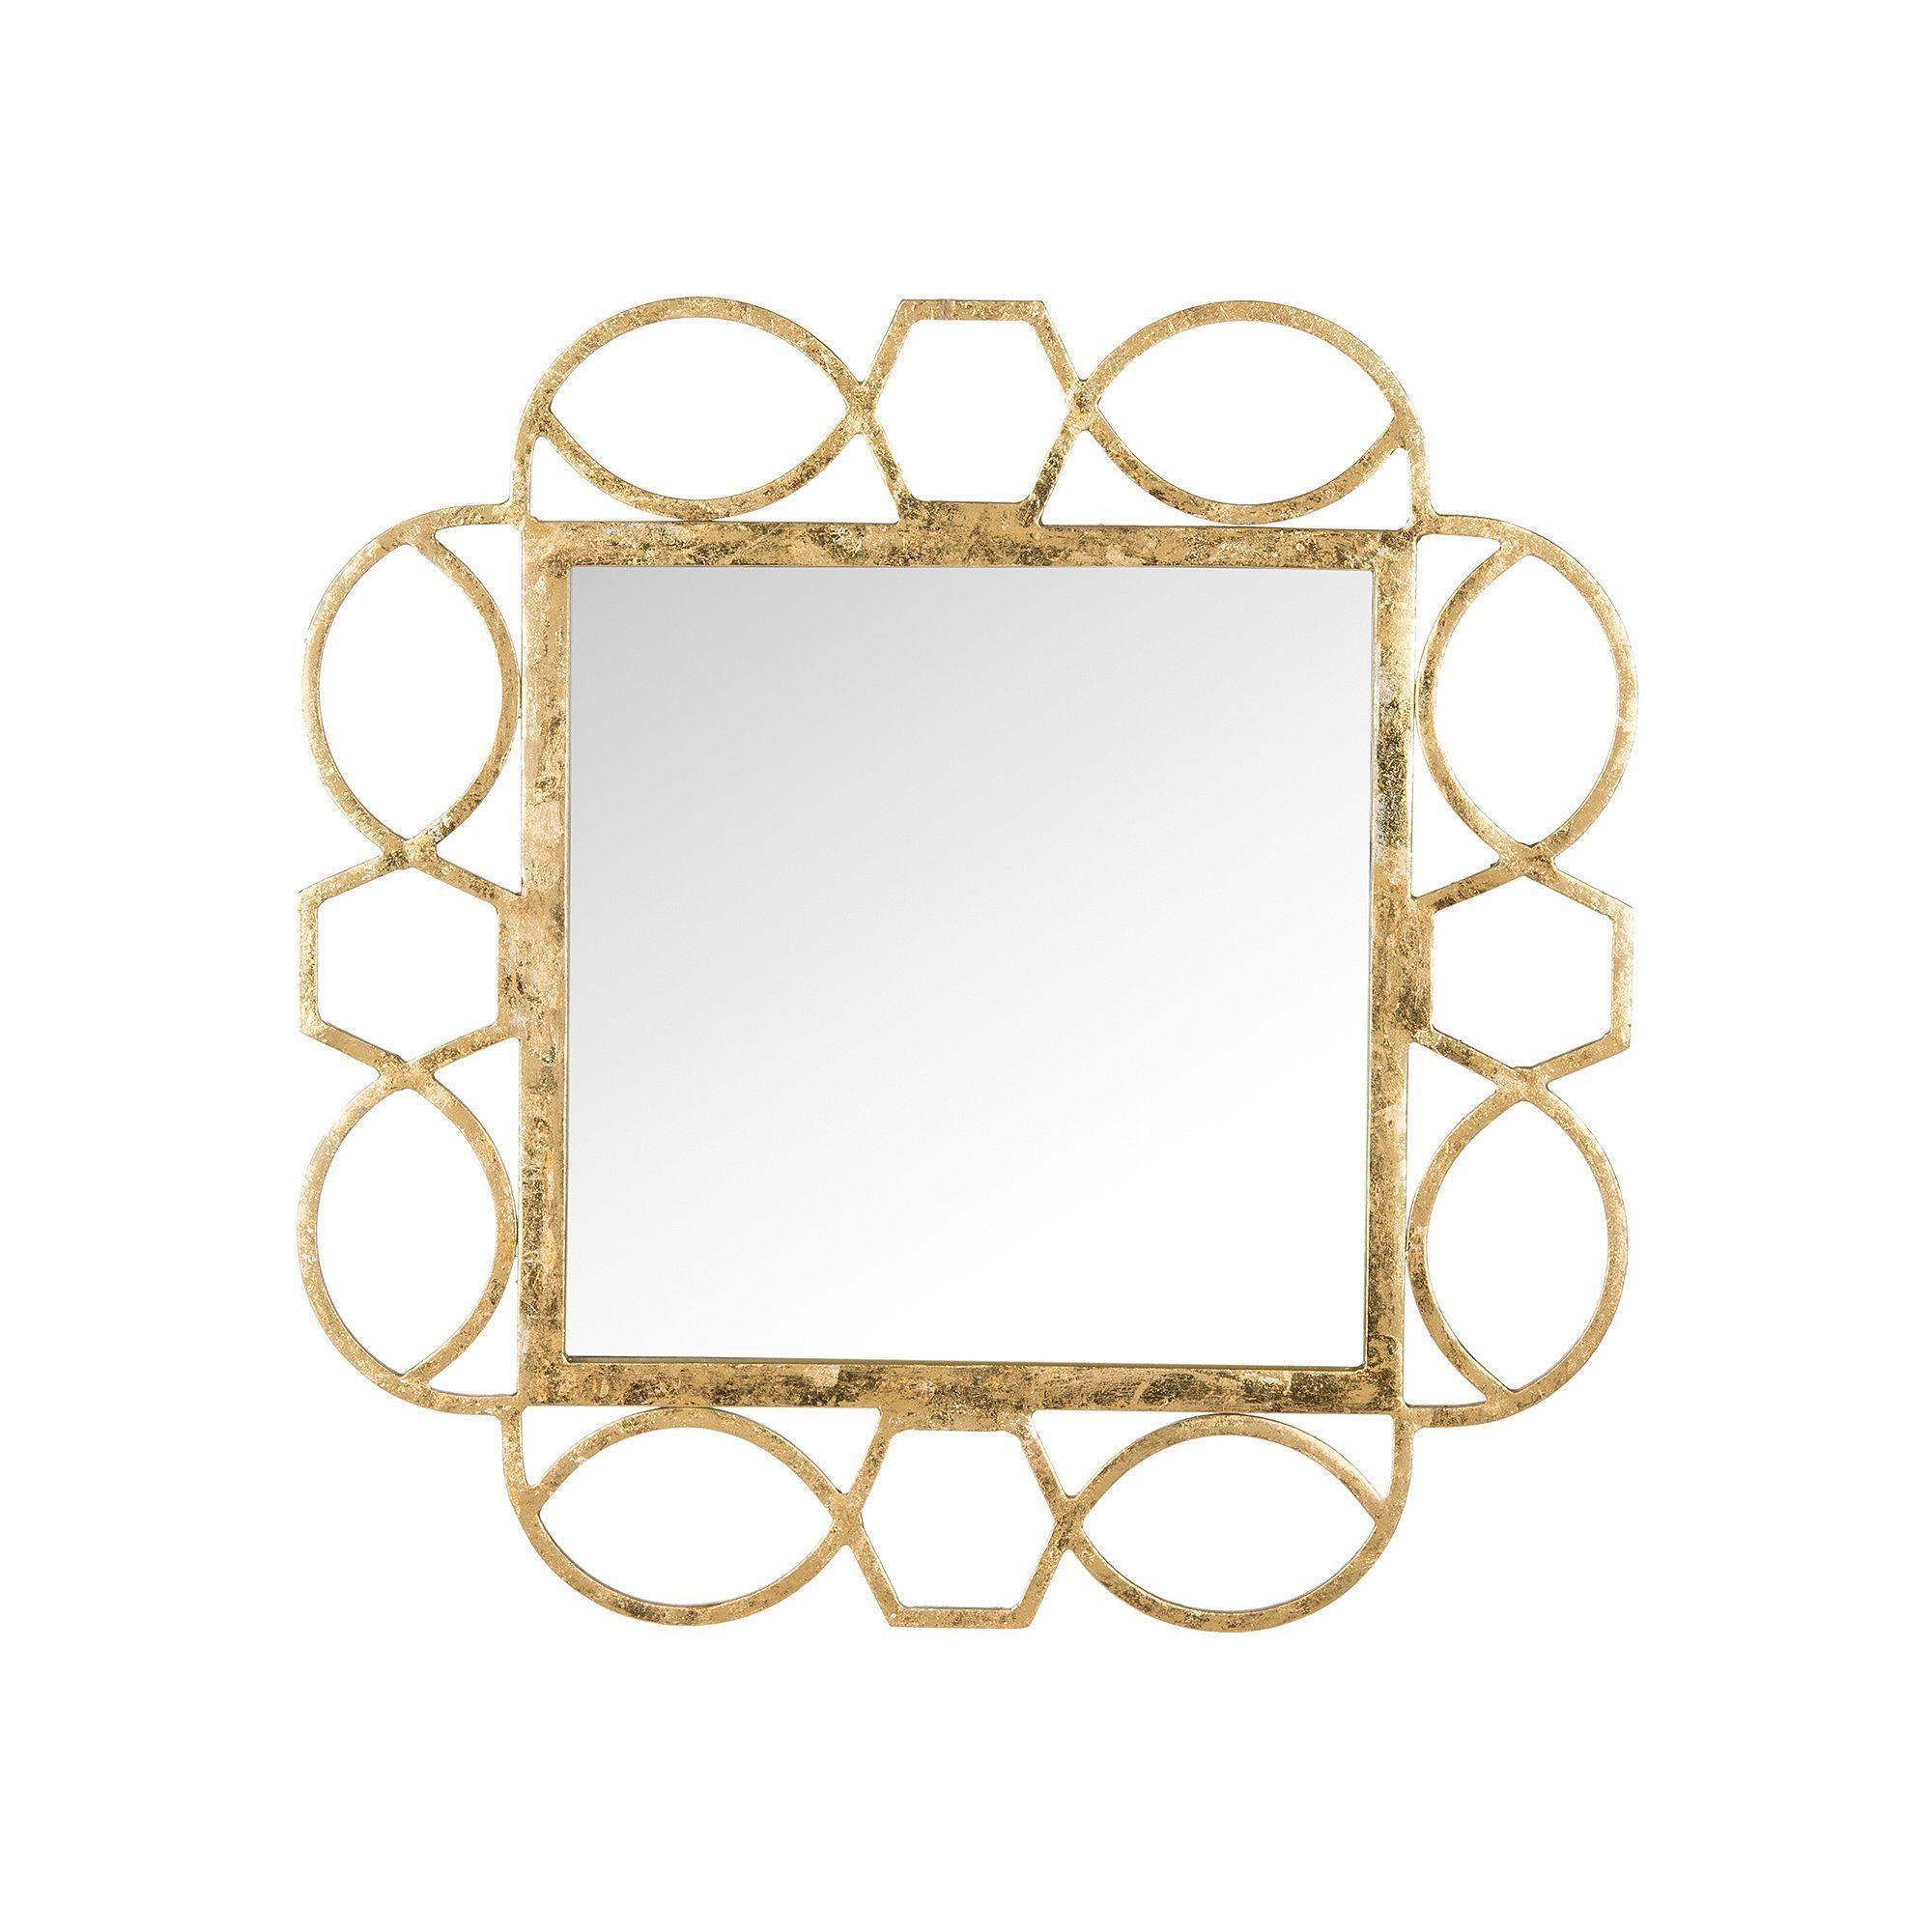 The Safavieh Alexandria Fretwork Wall Mirror  X In Offers